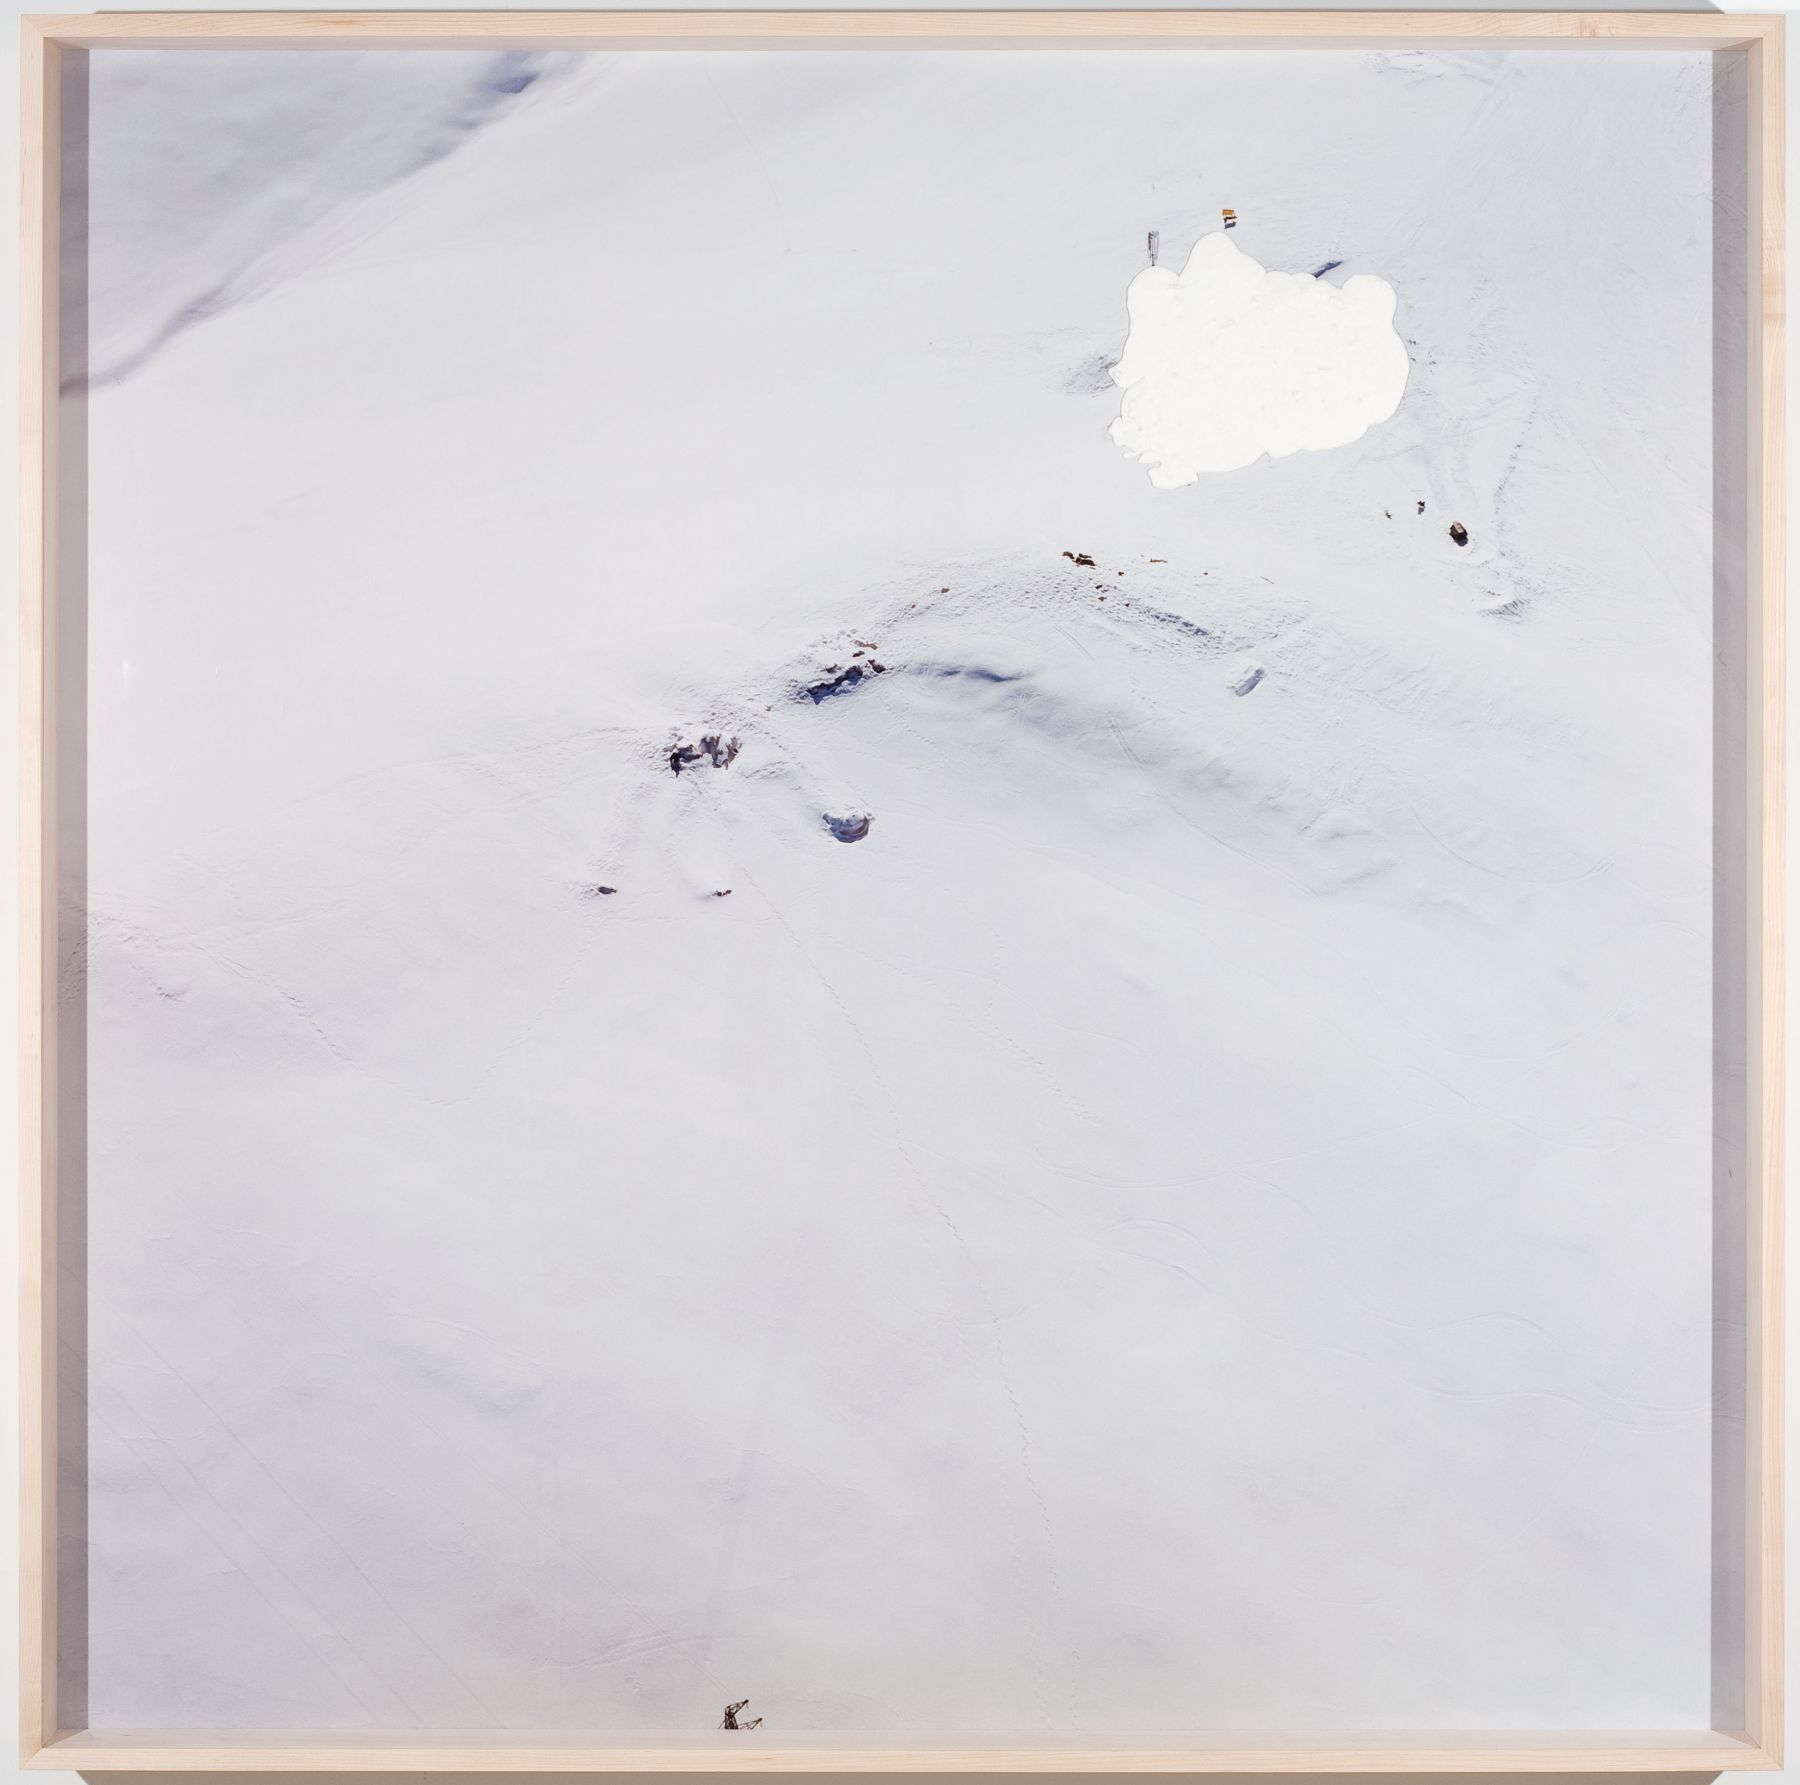 gelitin Hase, 2009 c-print with plasticine, framed 68 x 68 x 5 1/4 inches (framed dimensions) 172.7 x 172.7 x 13.3 cm